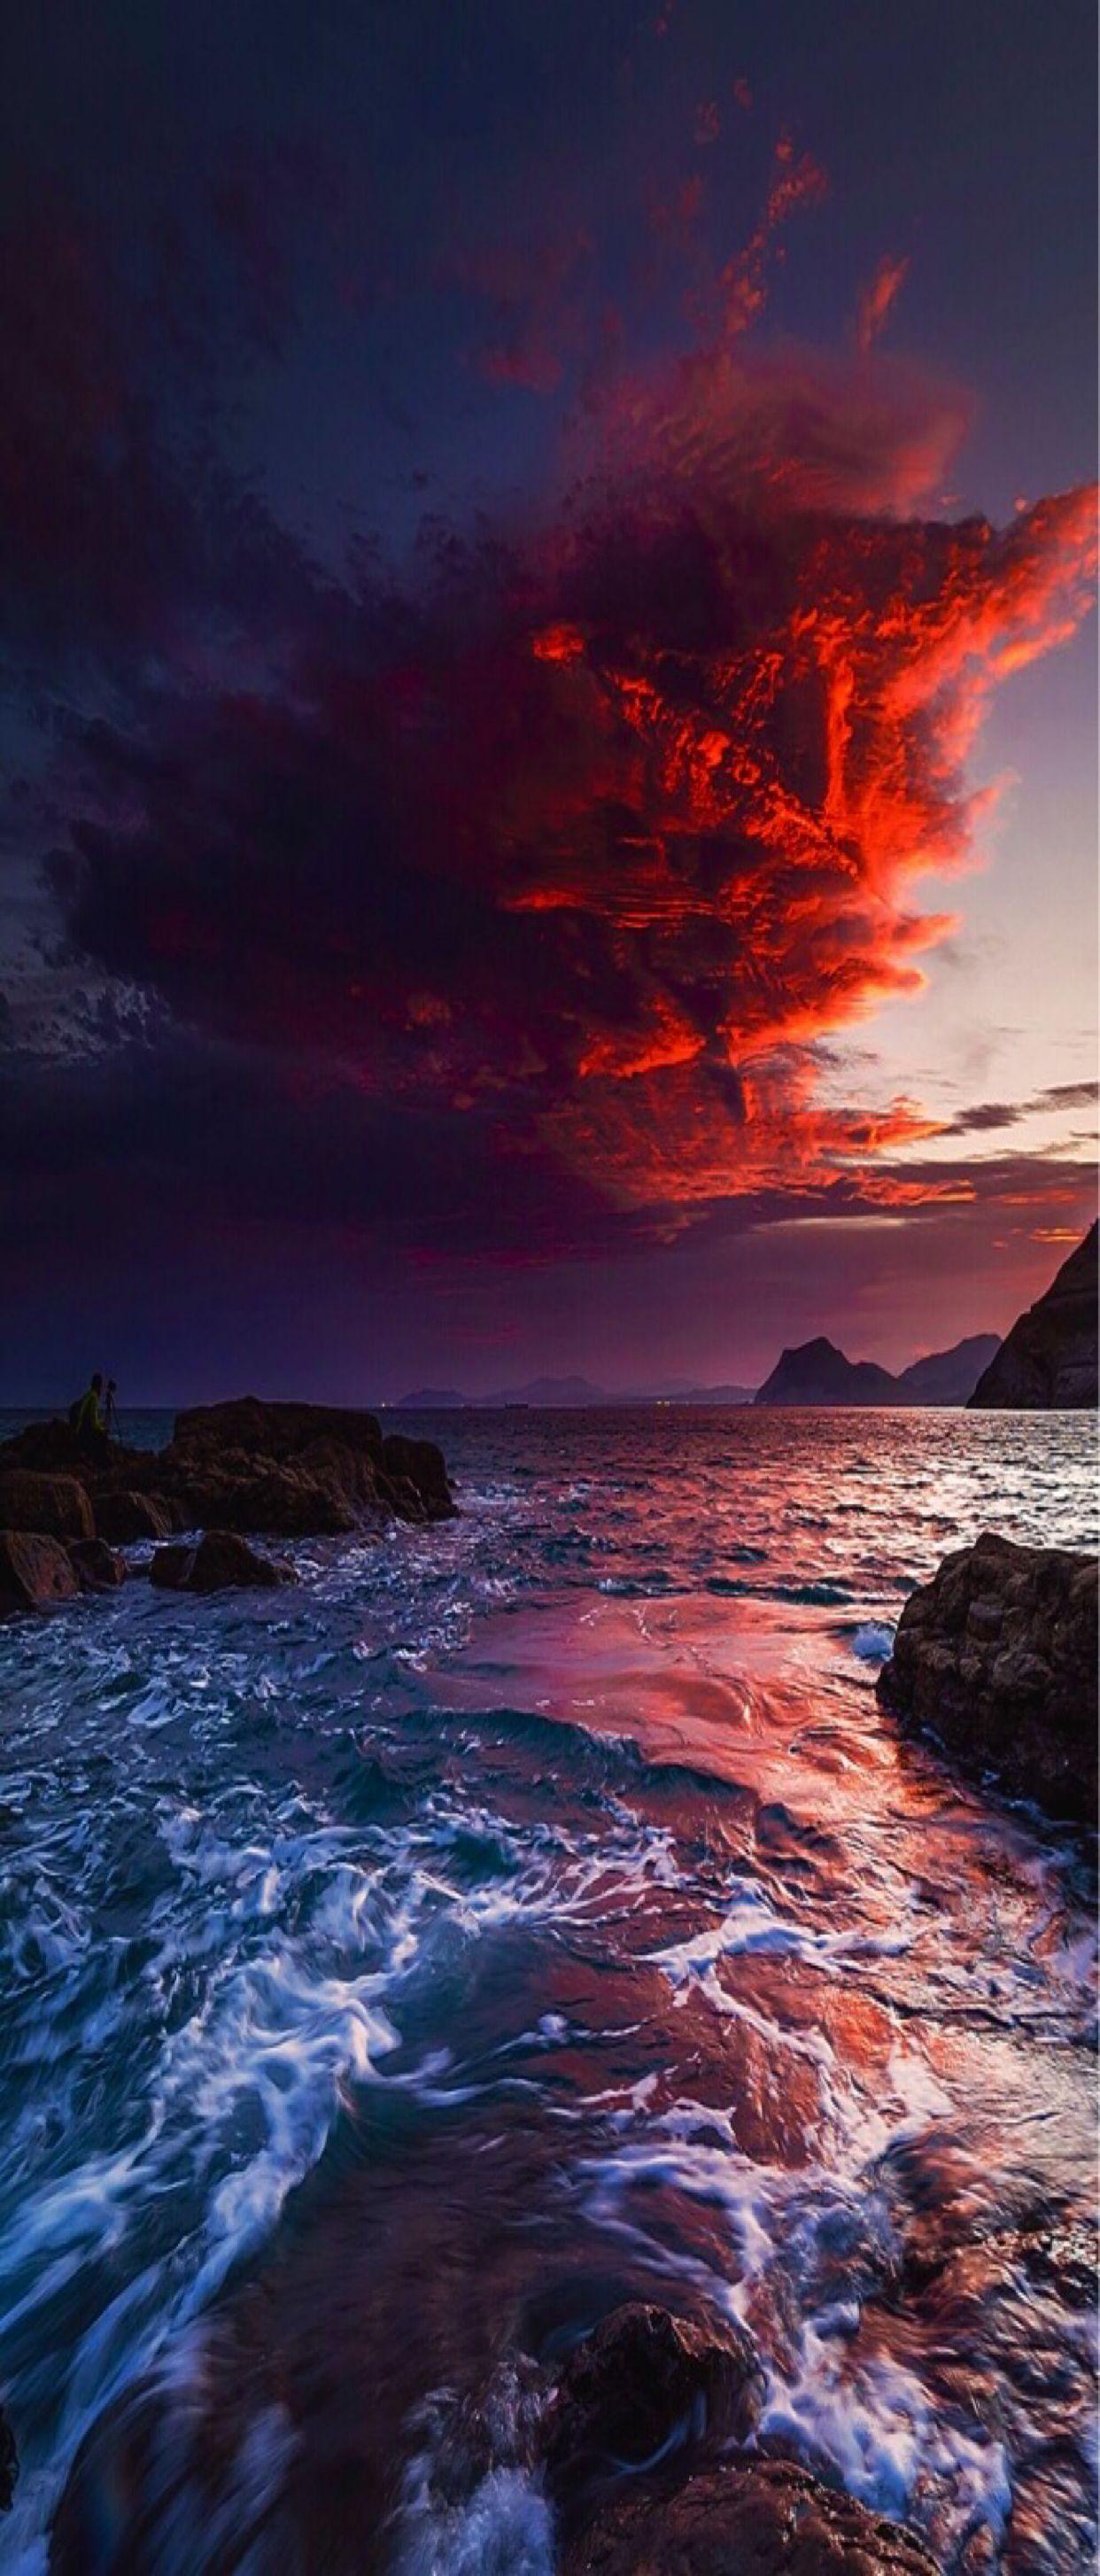 3d 4k Fbb Wallpaper S8 Wallpaper Backgrounds Nature Sunset Red Ocean